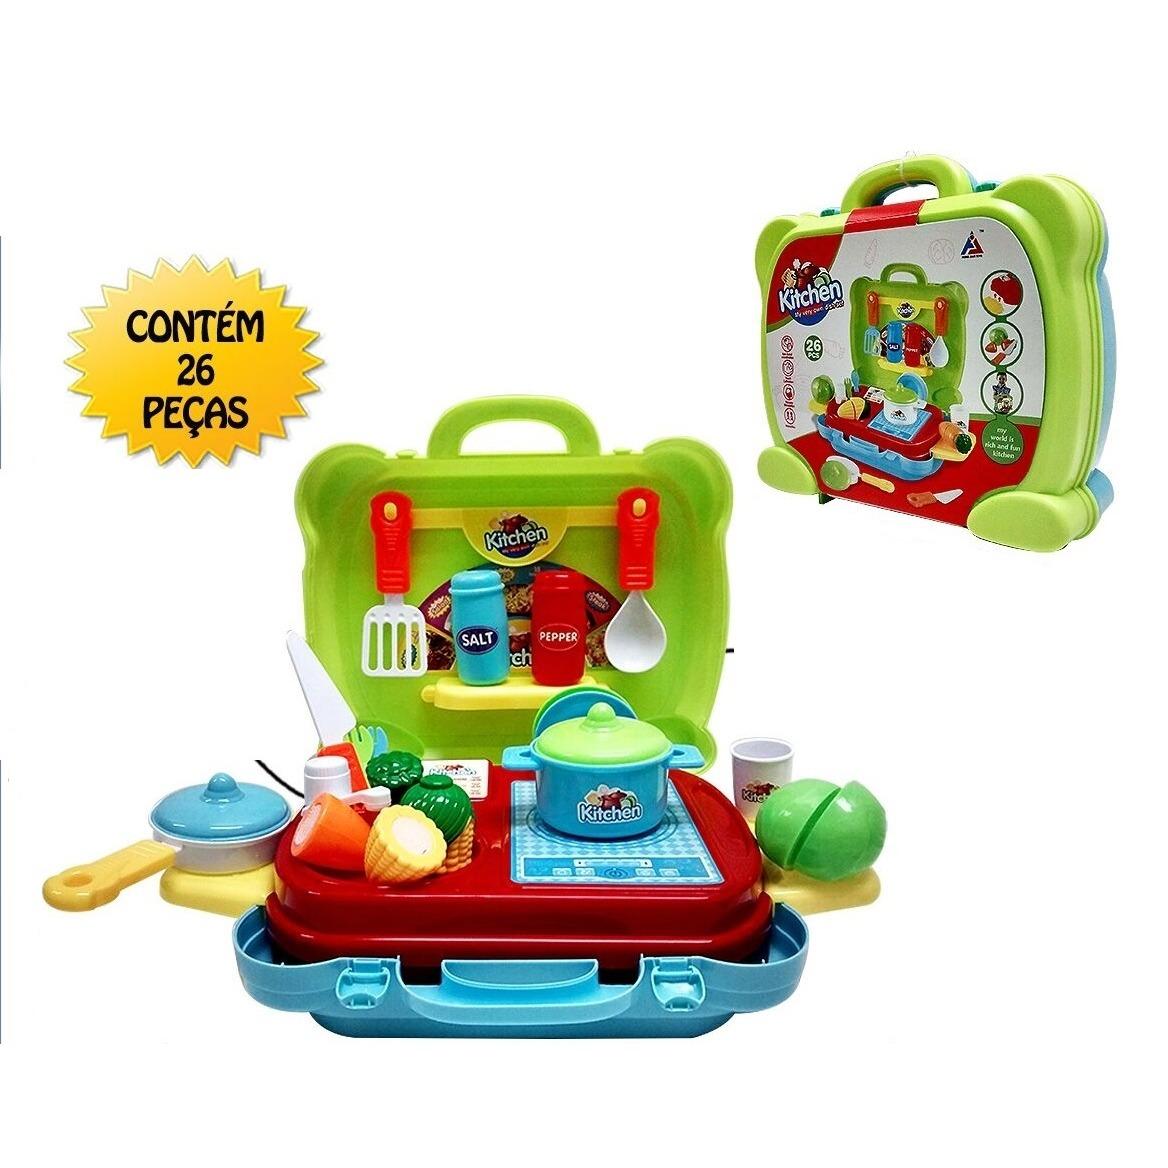 Kit Cozinha Infantil Completa Mini Mercado Portatil R 60 49 Em